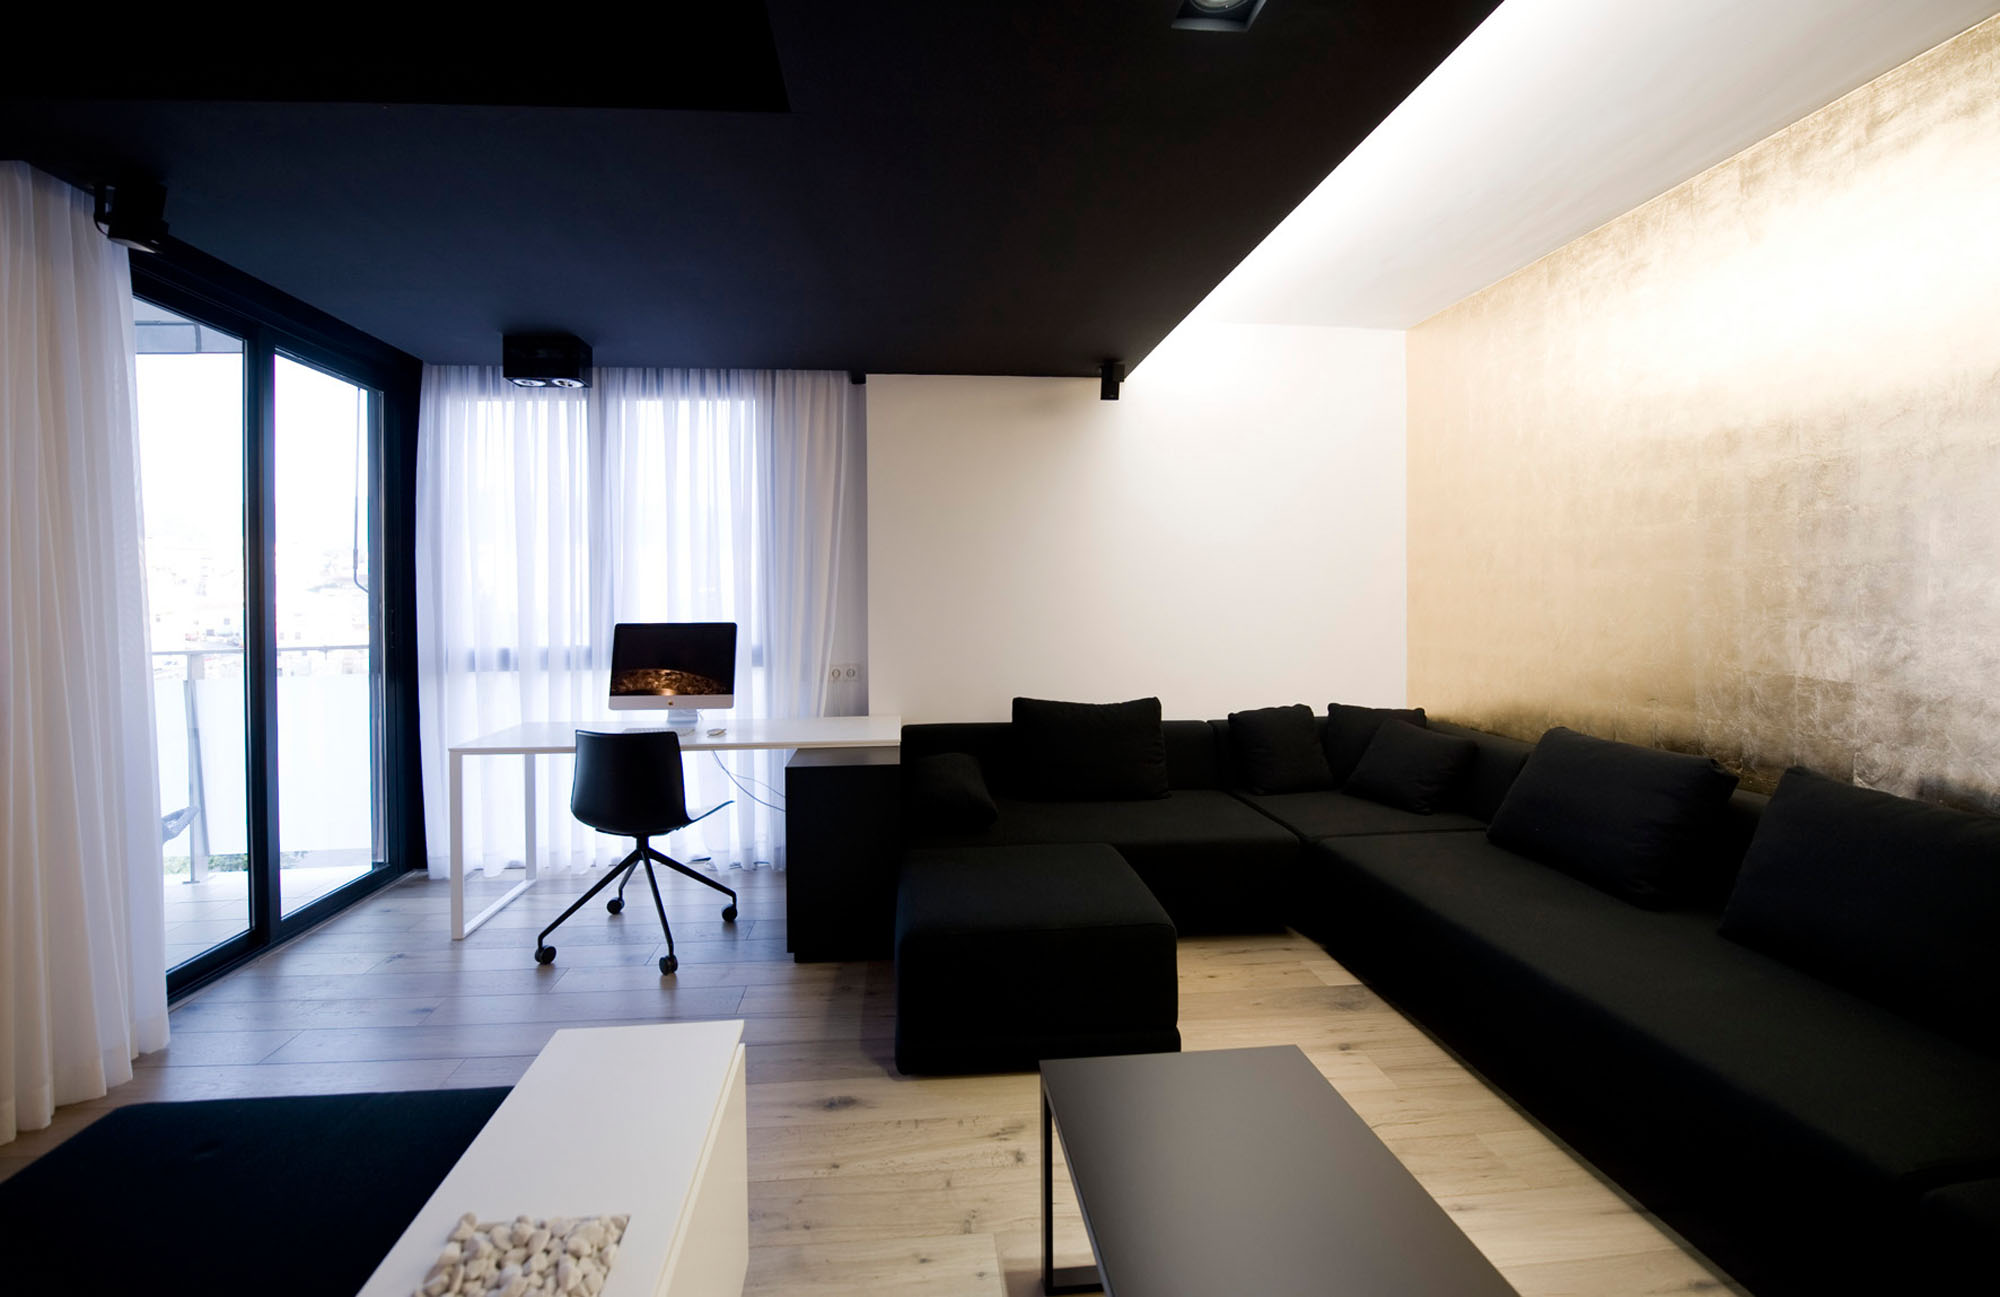 Minimalist Interior Design Black And White Icmt Set Minimalist Interior Design For Your Room,Builders Design Group